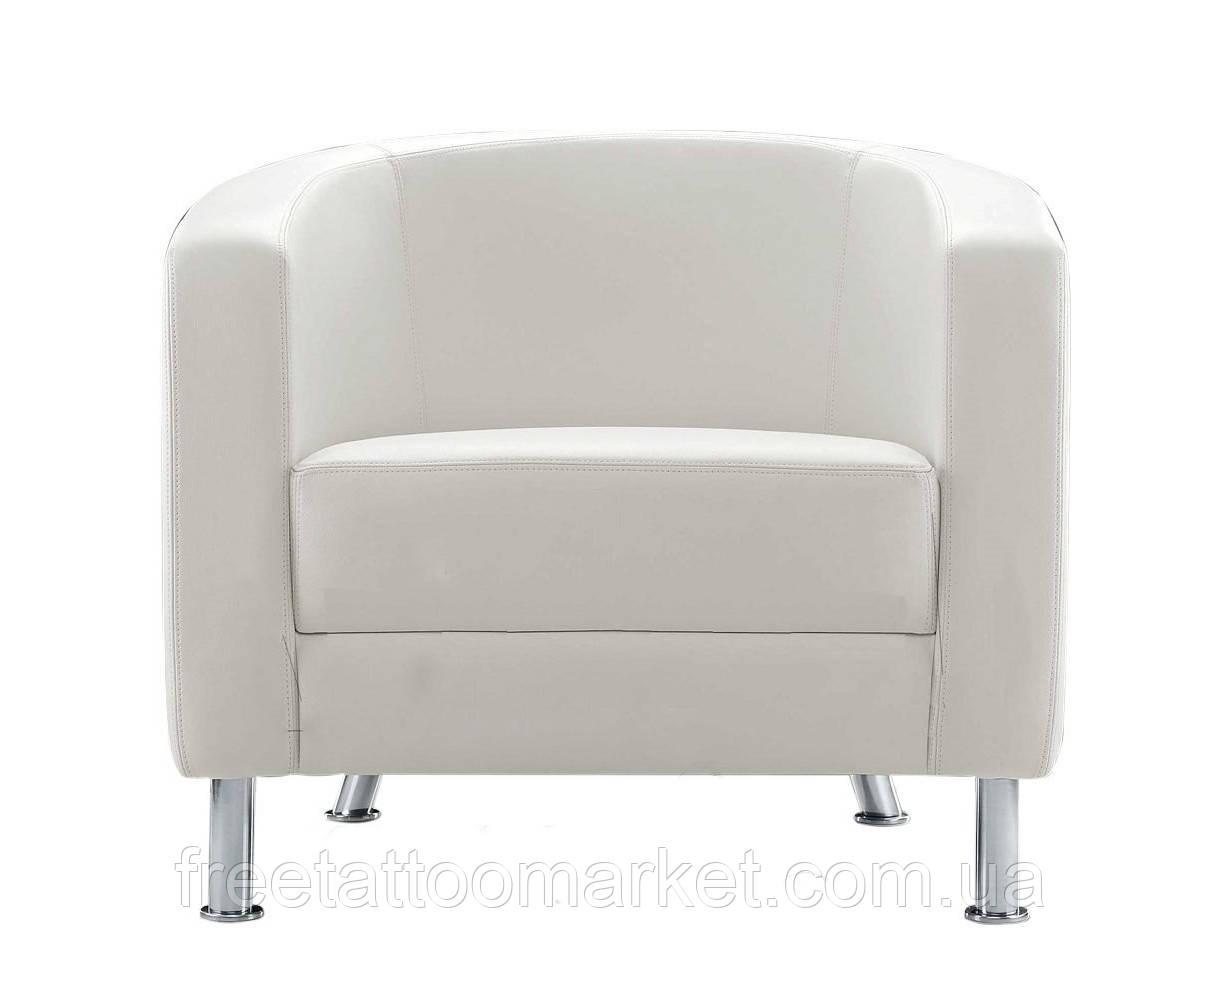 Кресло для ожидания VELMI  Манго (Ткань)